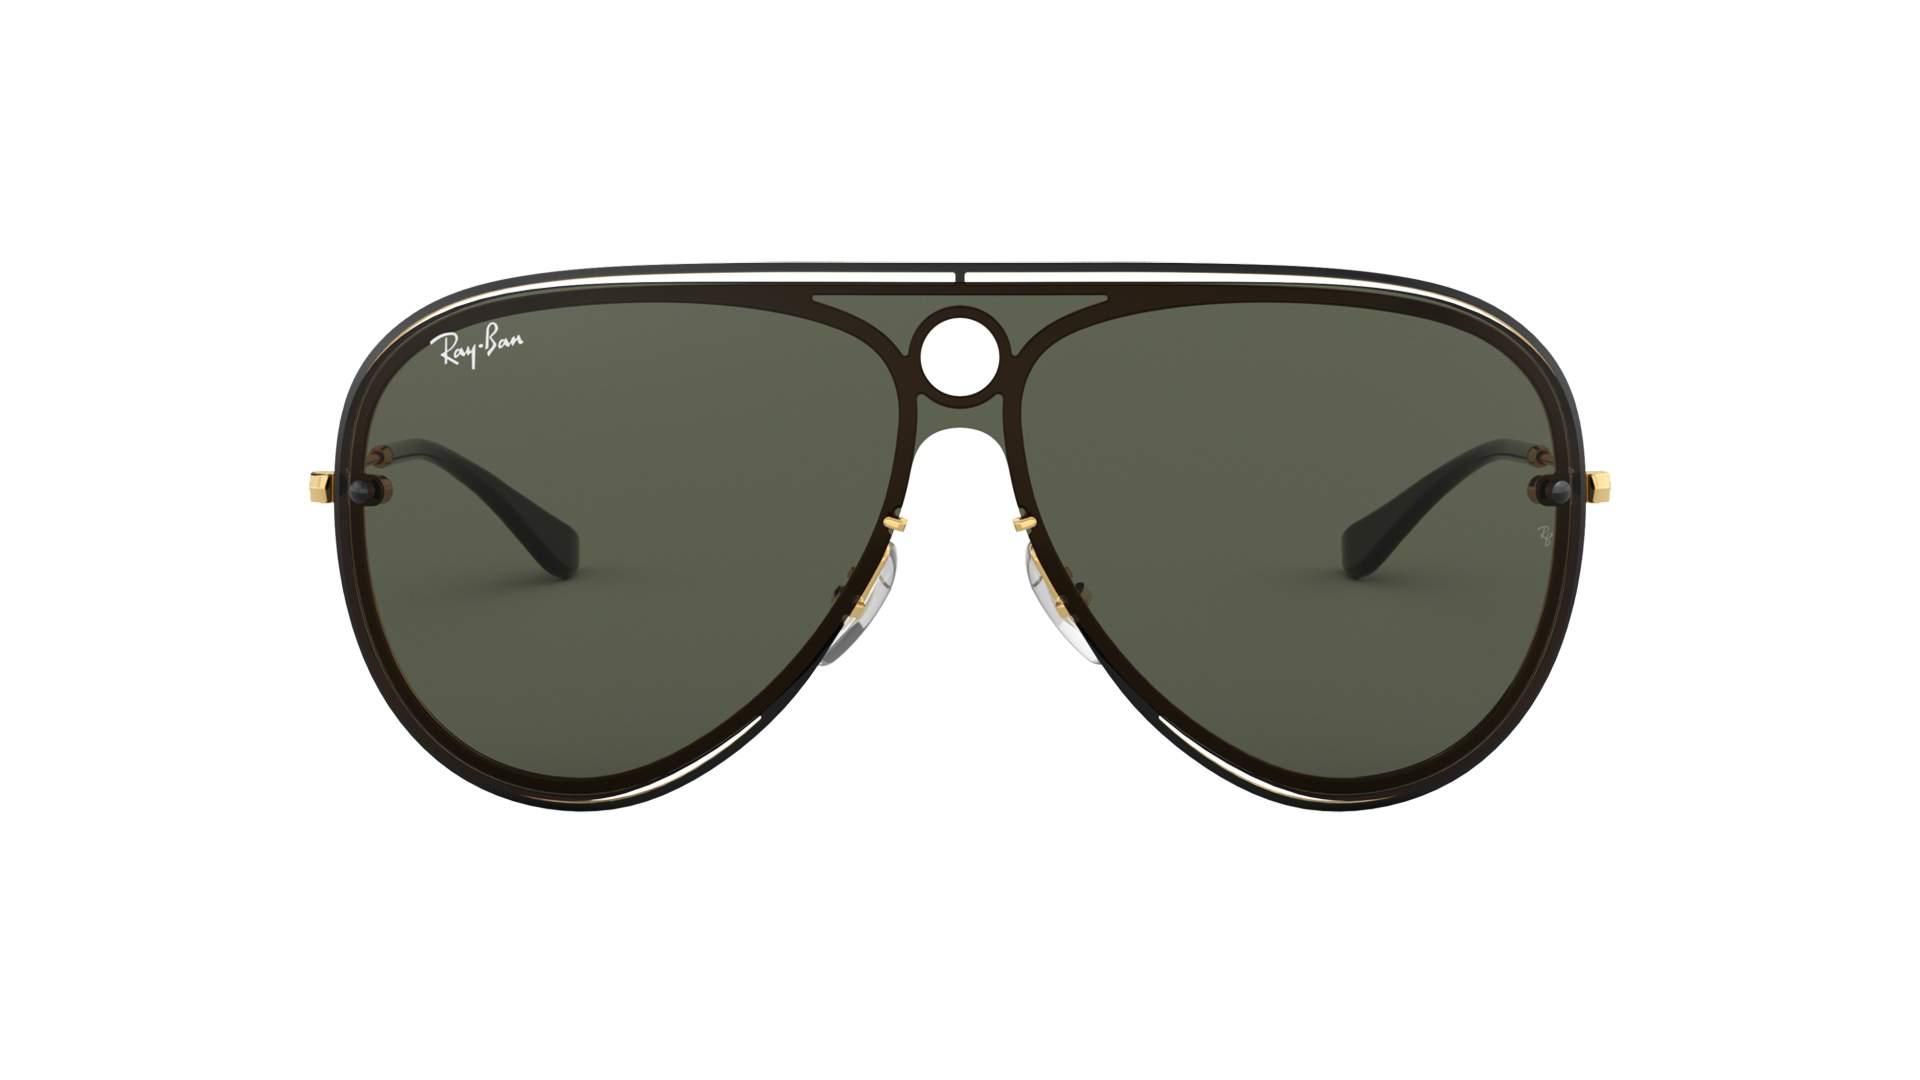 4b0ad4ec8b99a Sunglasses Ray-Ban Shooter Blaze Black RB3605N 187 71 32-20 Medium